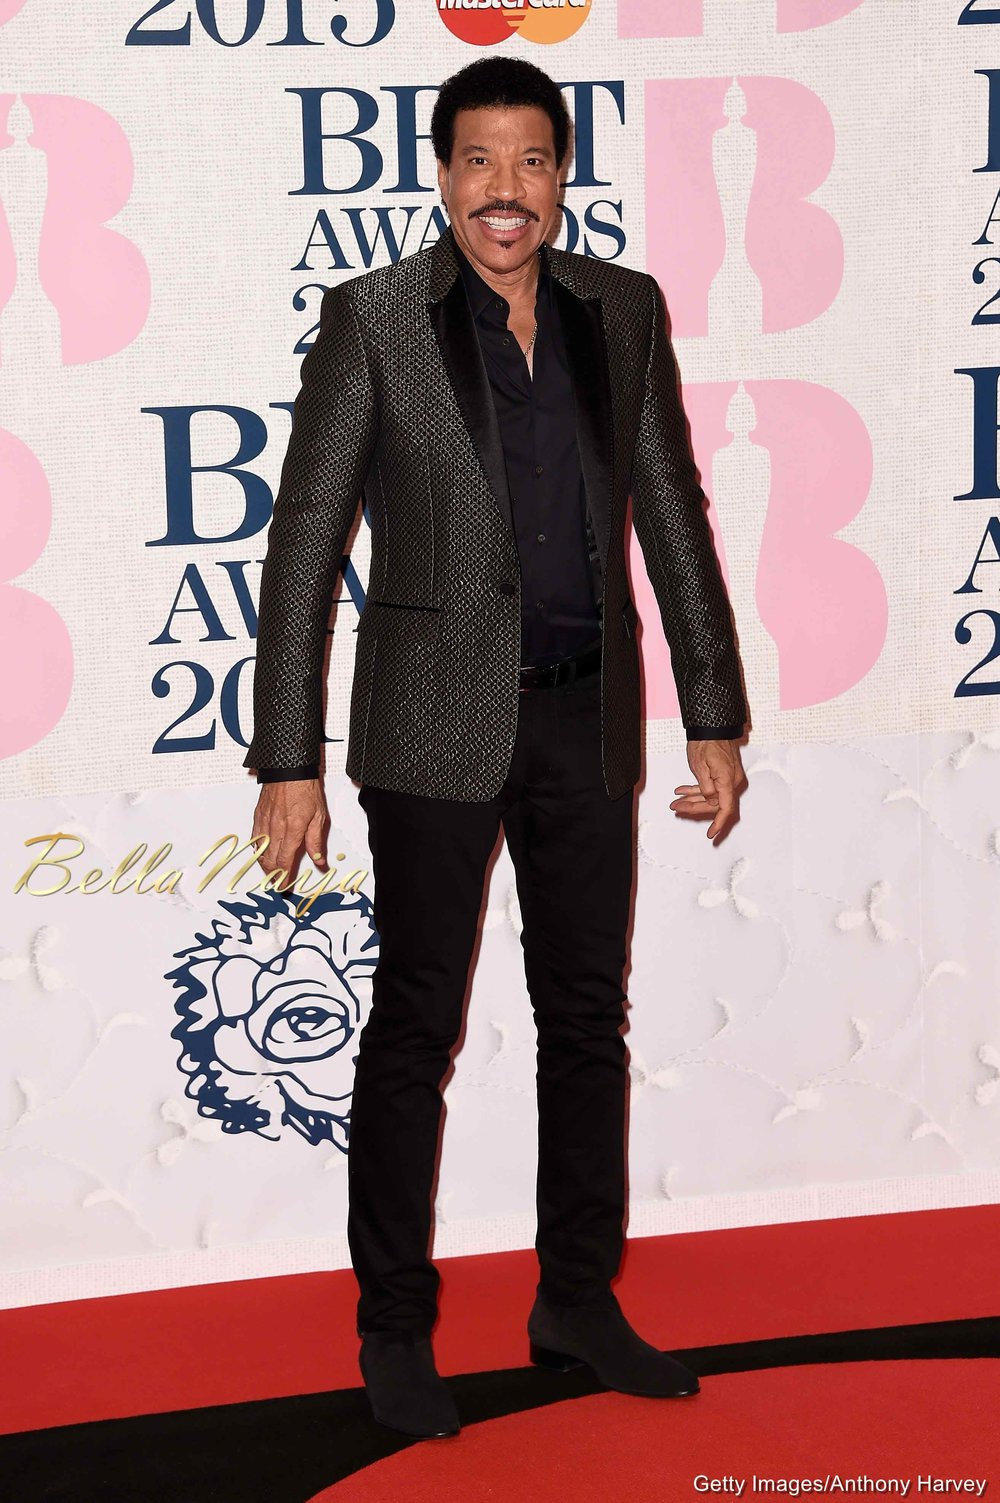 BRIT-Awards-Red-Carpet-February-2015-BellaNaija0015.jpg